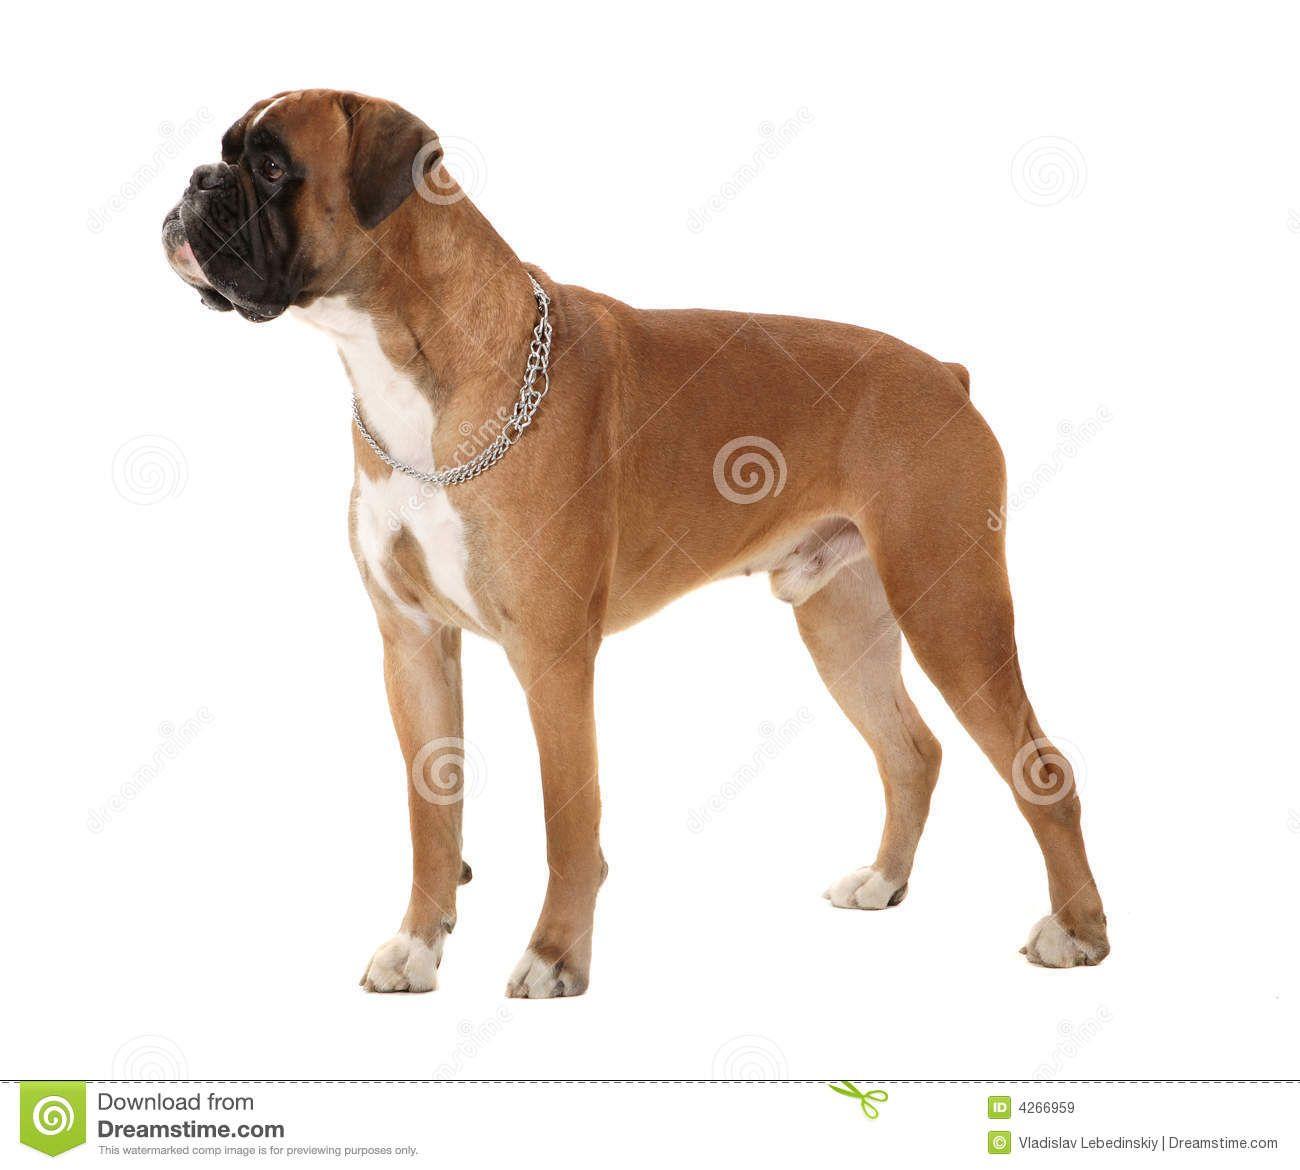 boxer dog front view - Αναζήτηση Google | dog anatomy refernce ...